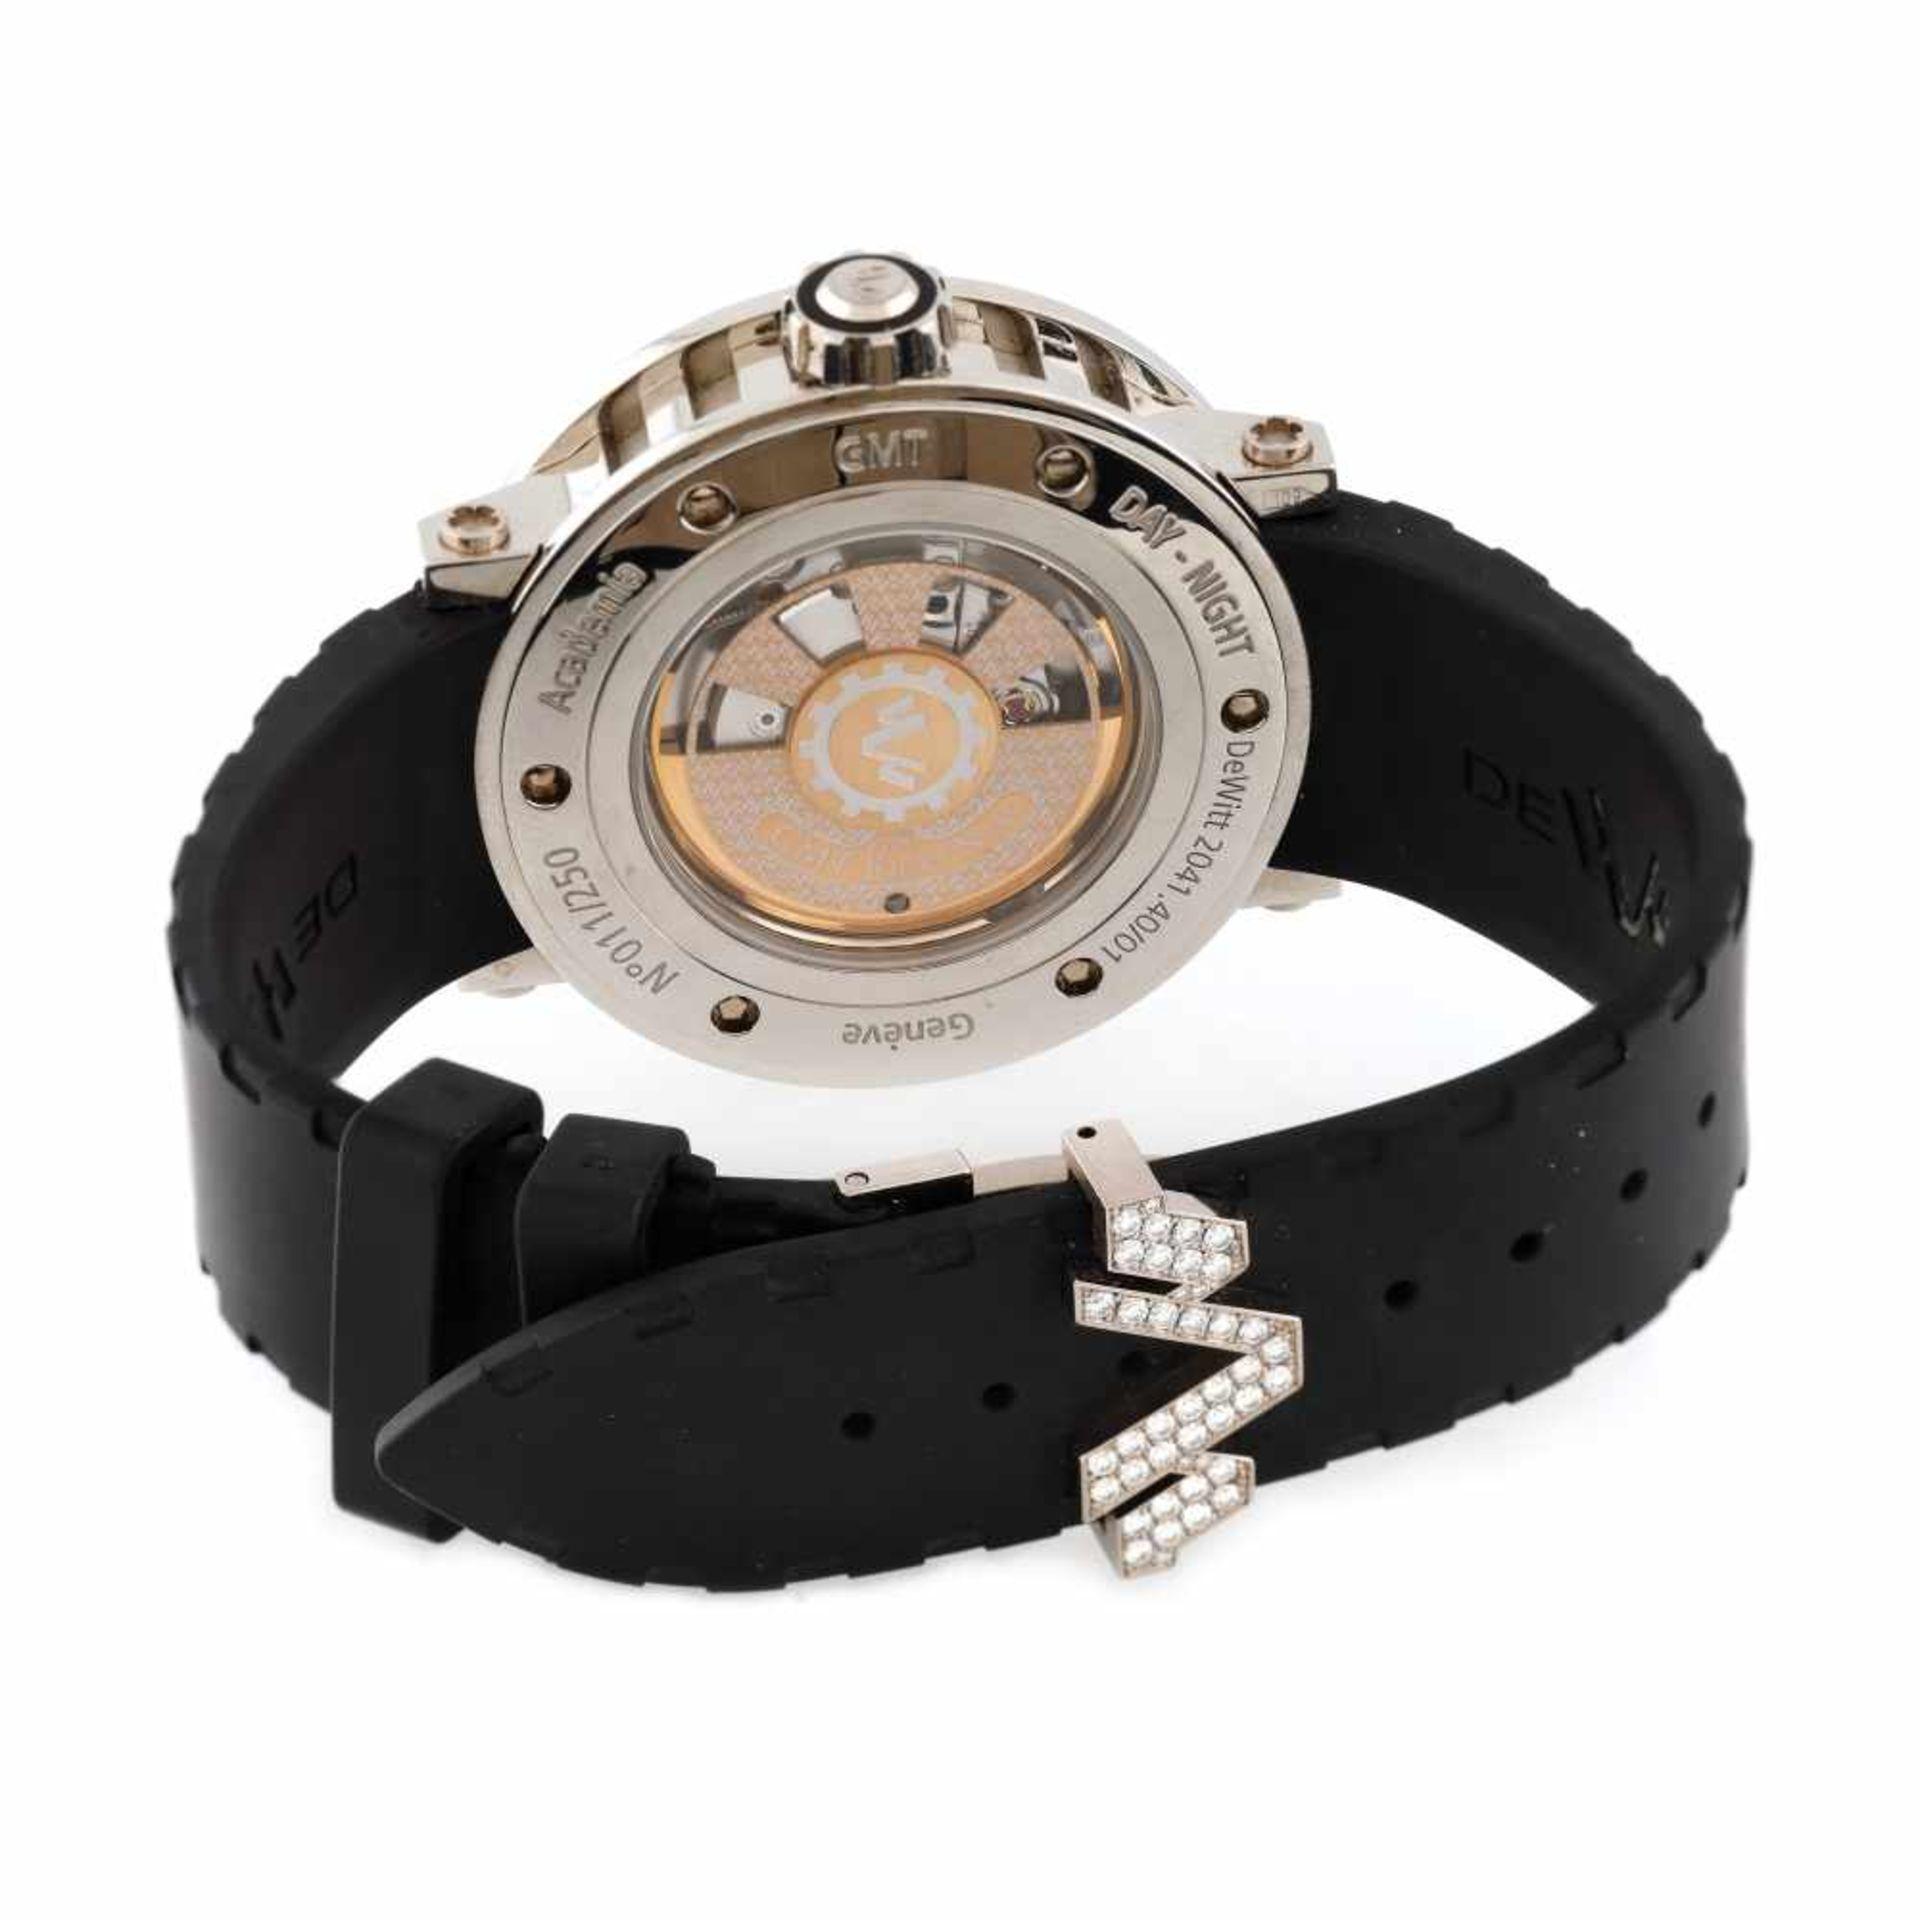 Dewitt Academia Triple Complication wristwatch, limited edition 11/250, provenance documents and ori - Bild 3 aus 4